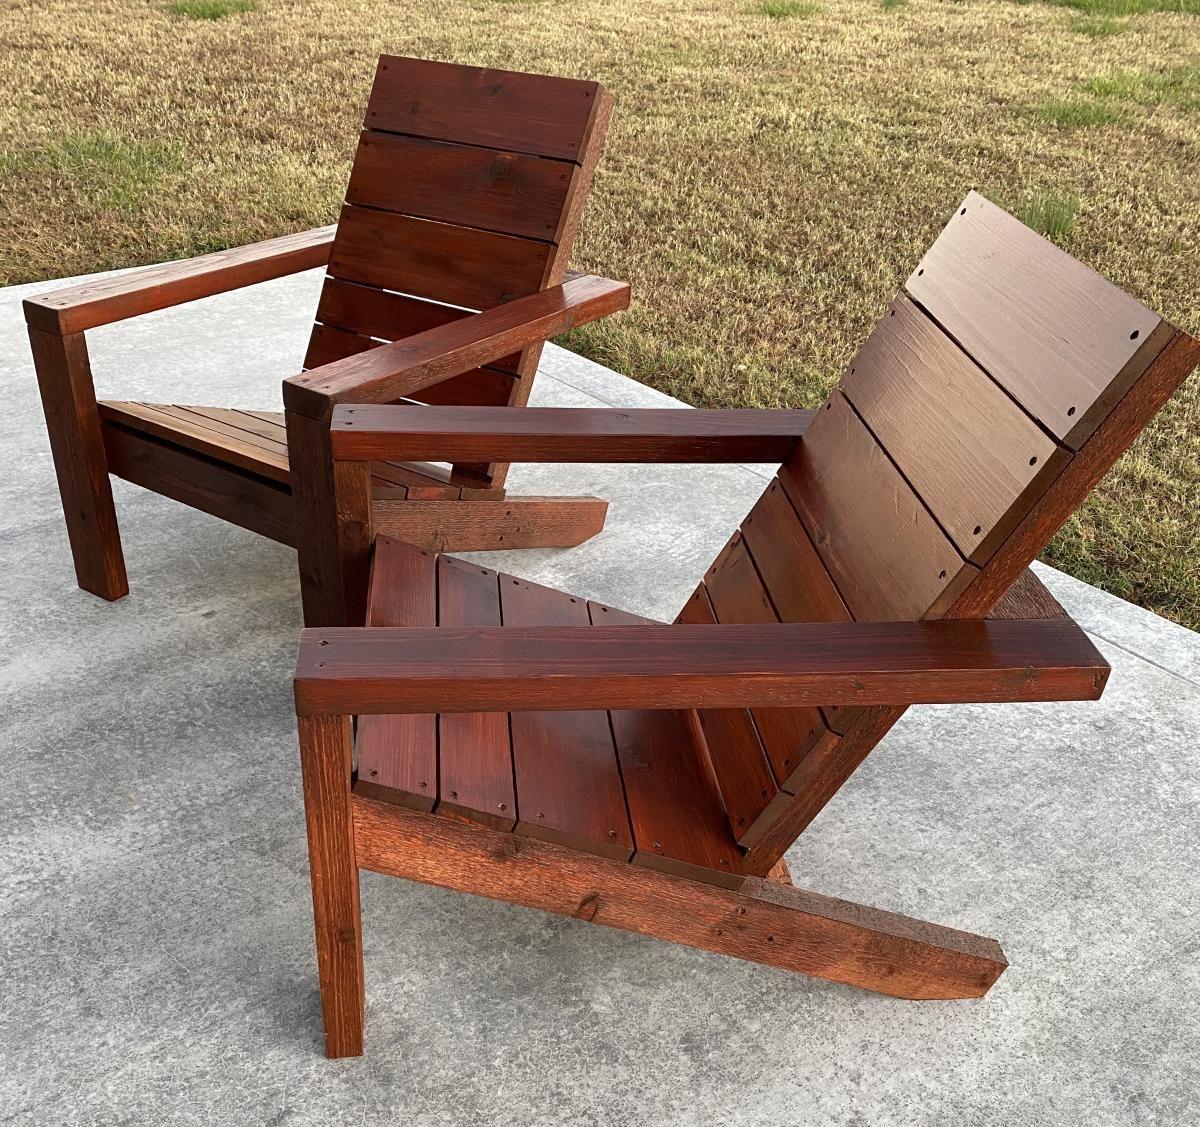 2x4 Modern Adirondack Chair Ana White In 2020 Modern Adirondack Chair Adirondack Chair Modern Adirondack